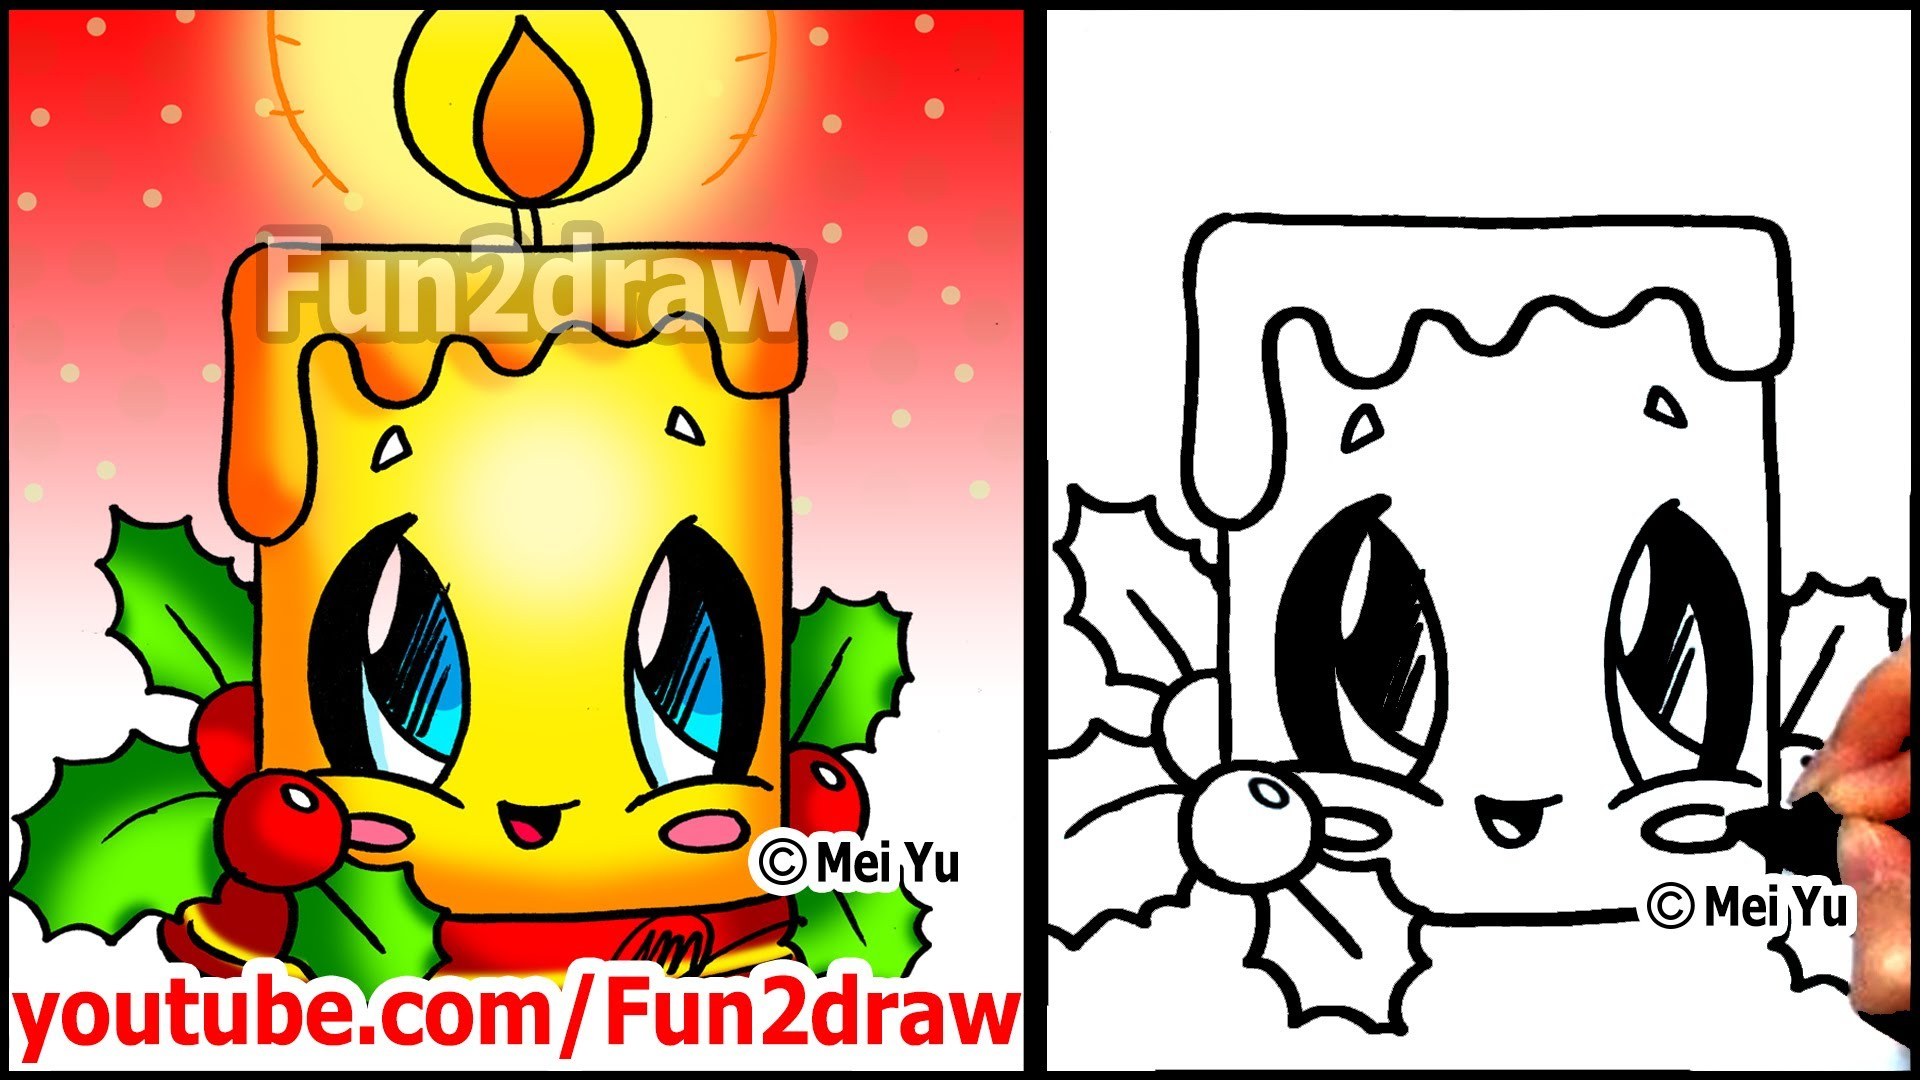 Drawn snowflake fun2draw Christmas Draw Christmas to Pictures